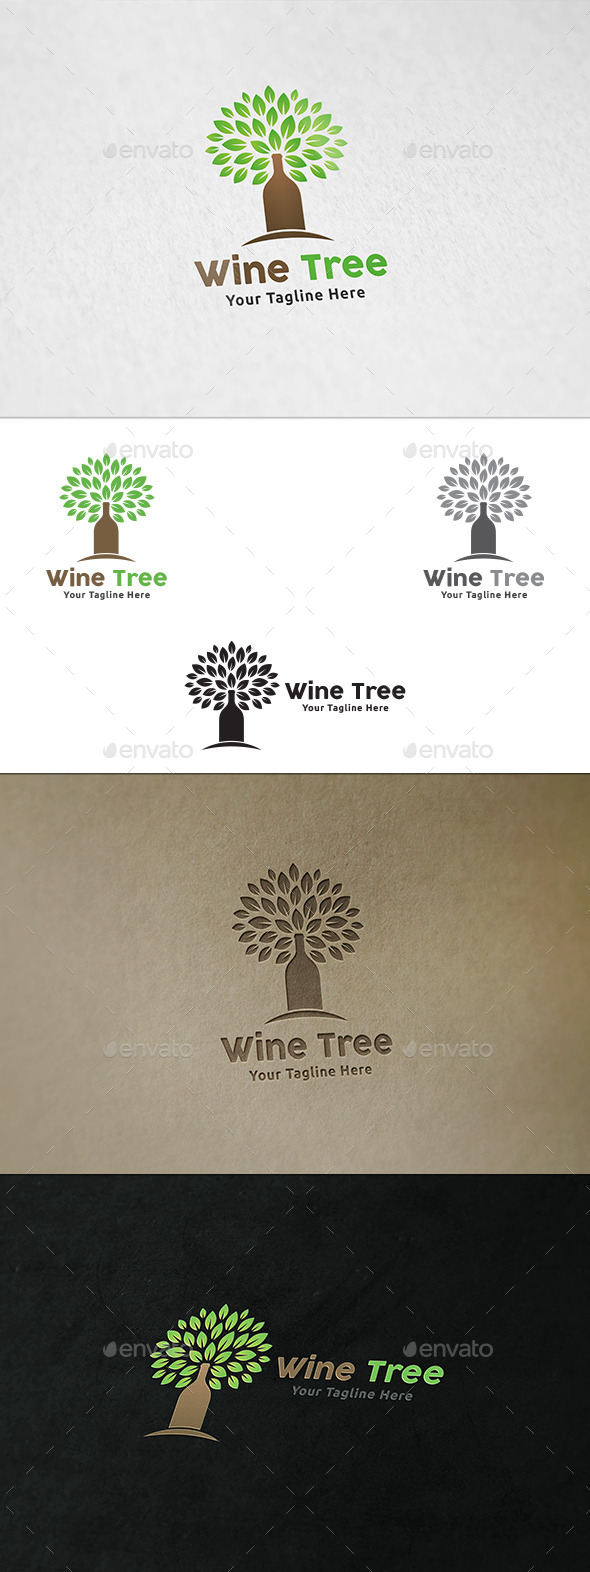 GraphicRiver Wine Tree Logo Template 11908544